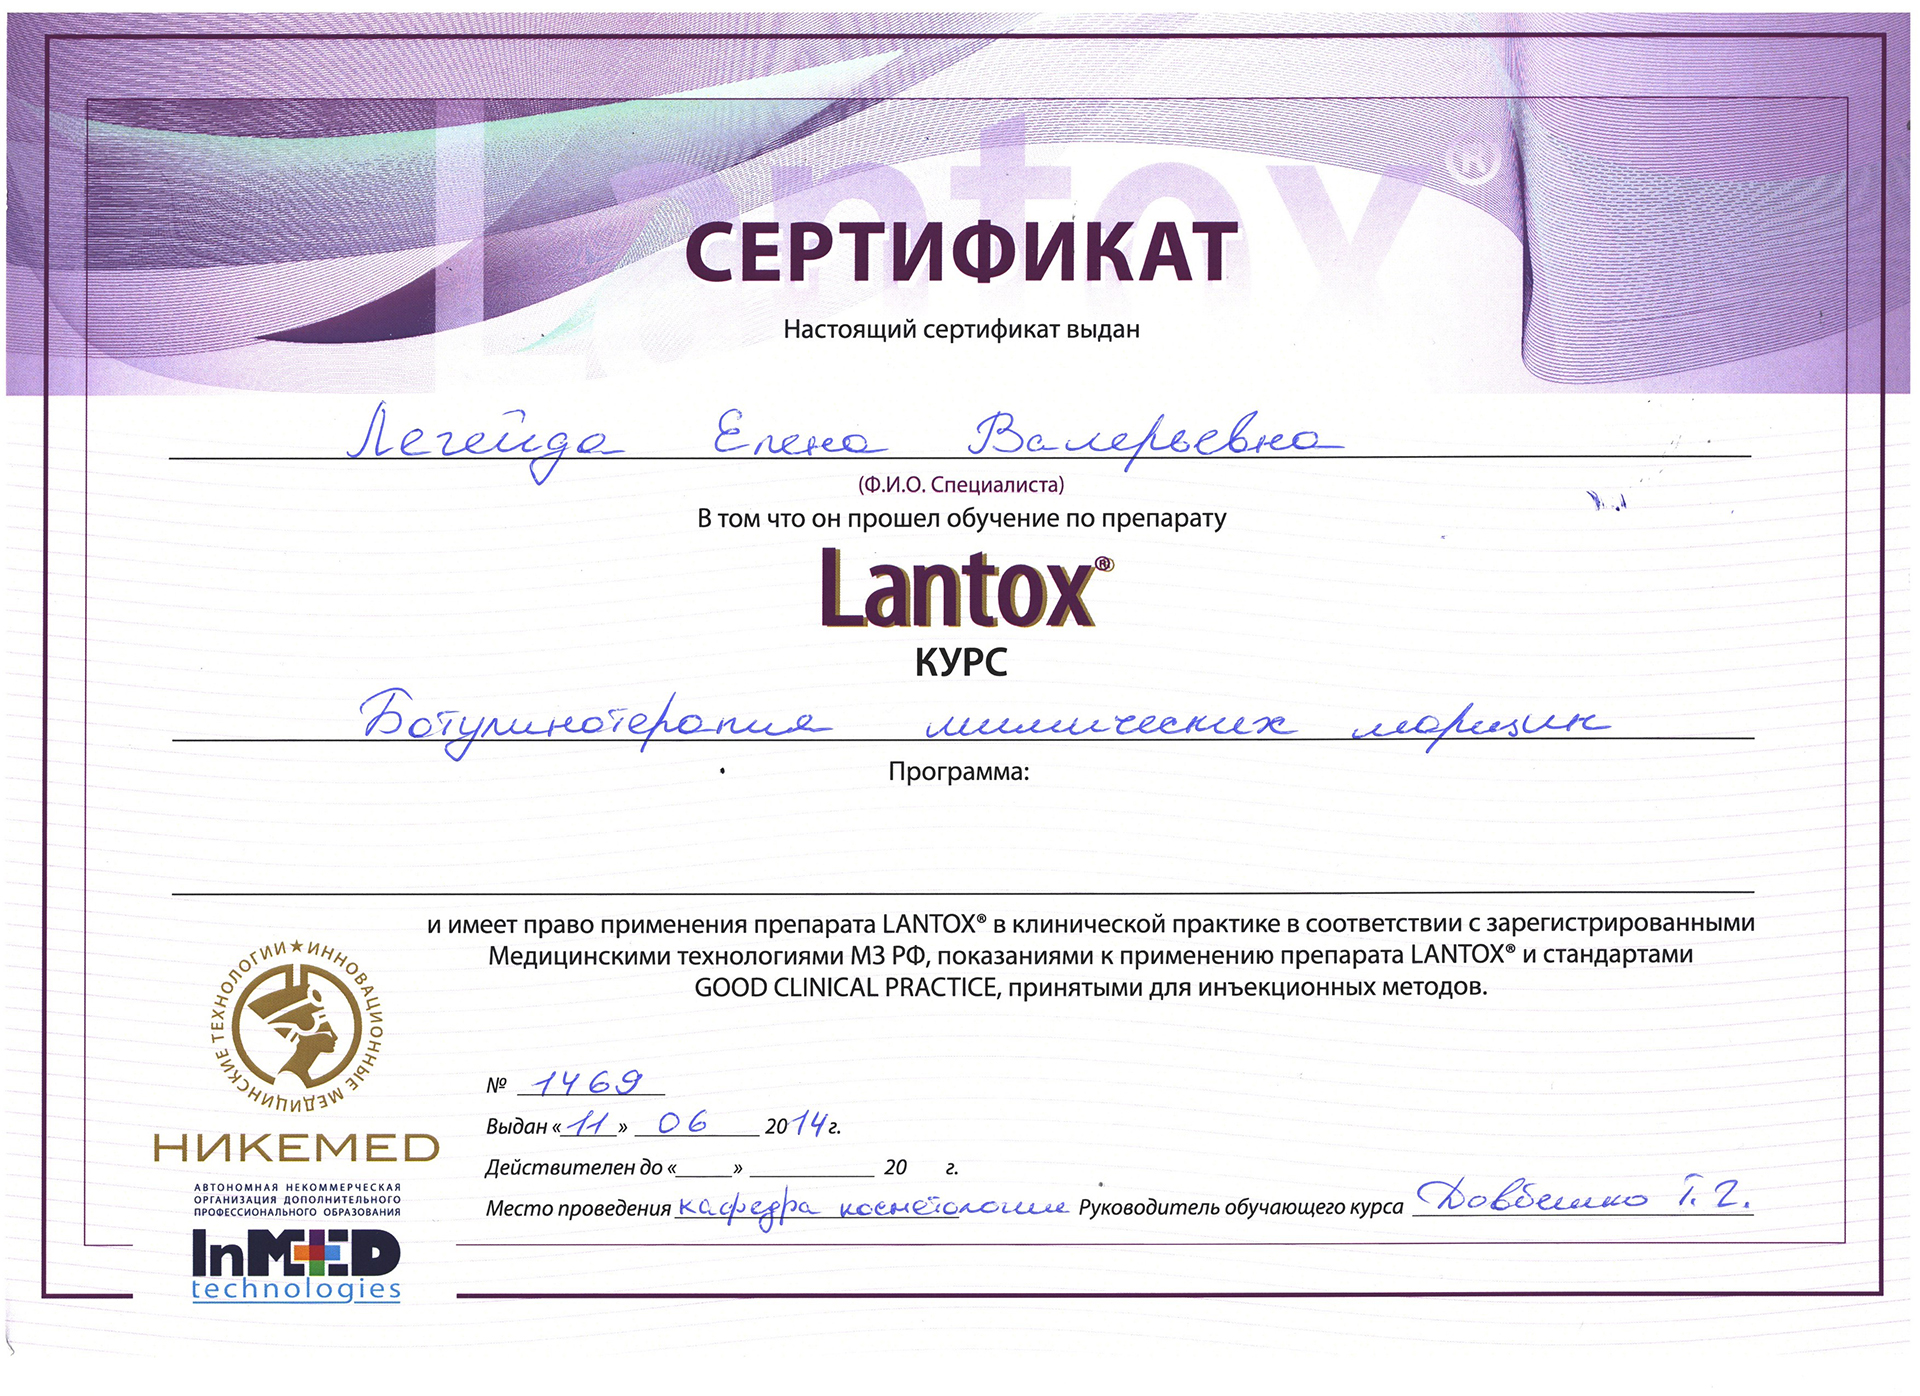 Сертификат — Обучение по препарату «Lantox». Легейда Елена Валерьевна